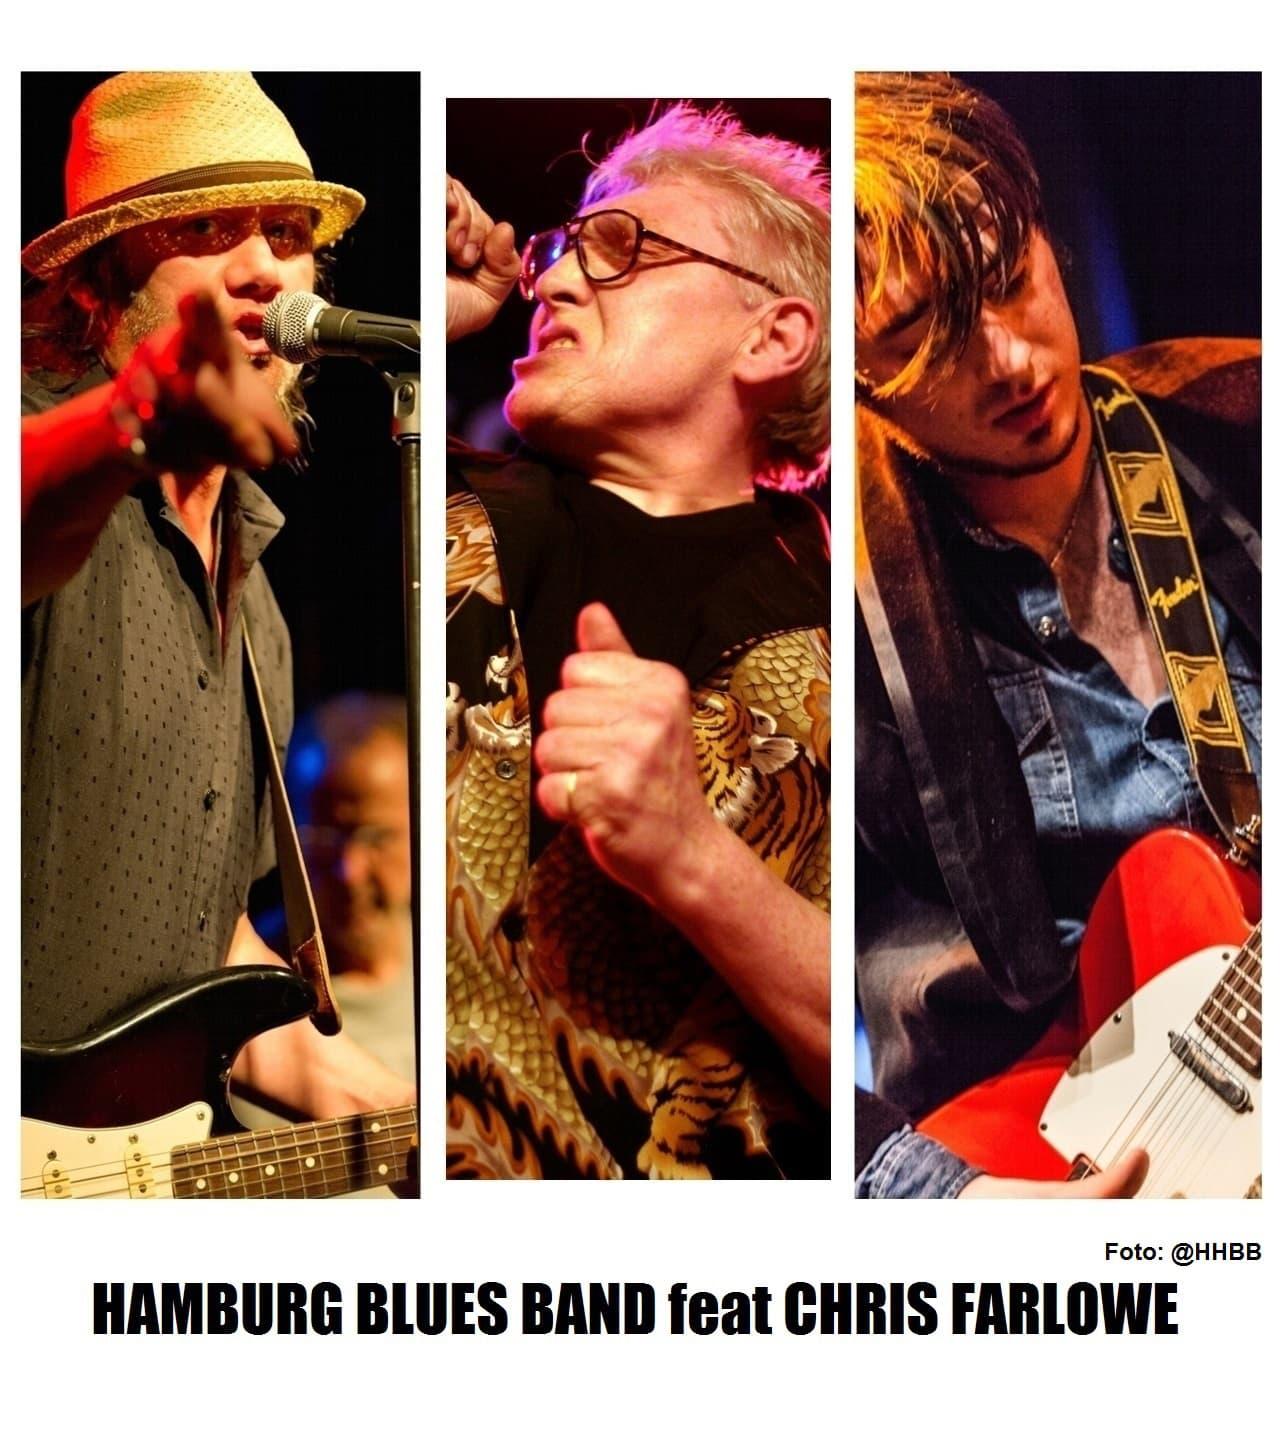 Hamburg Blues Band feat Chris Farlowe